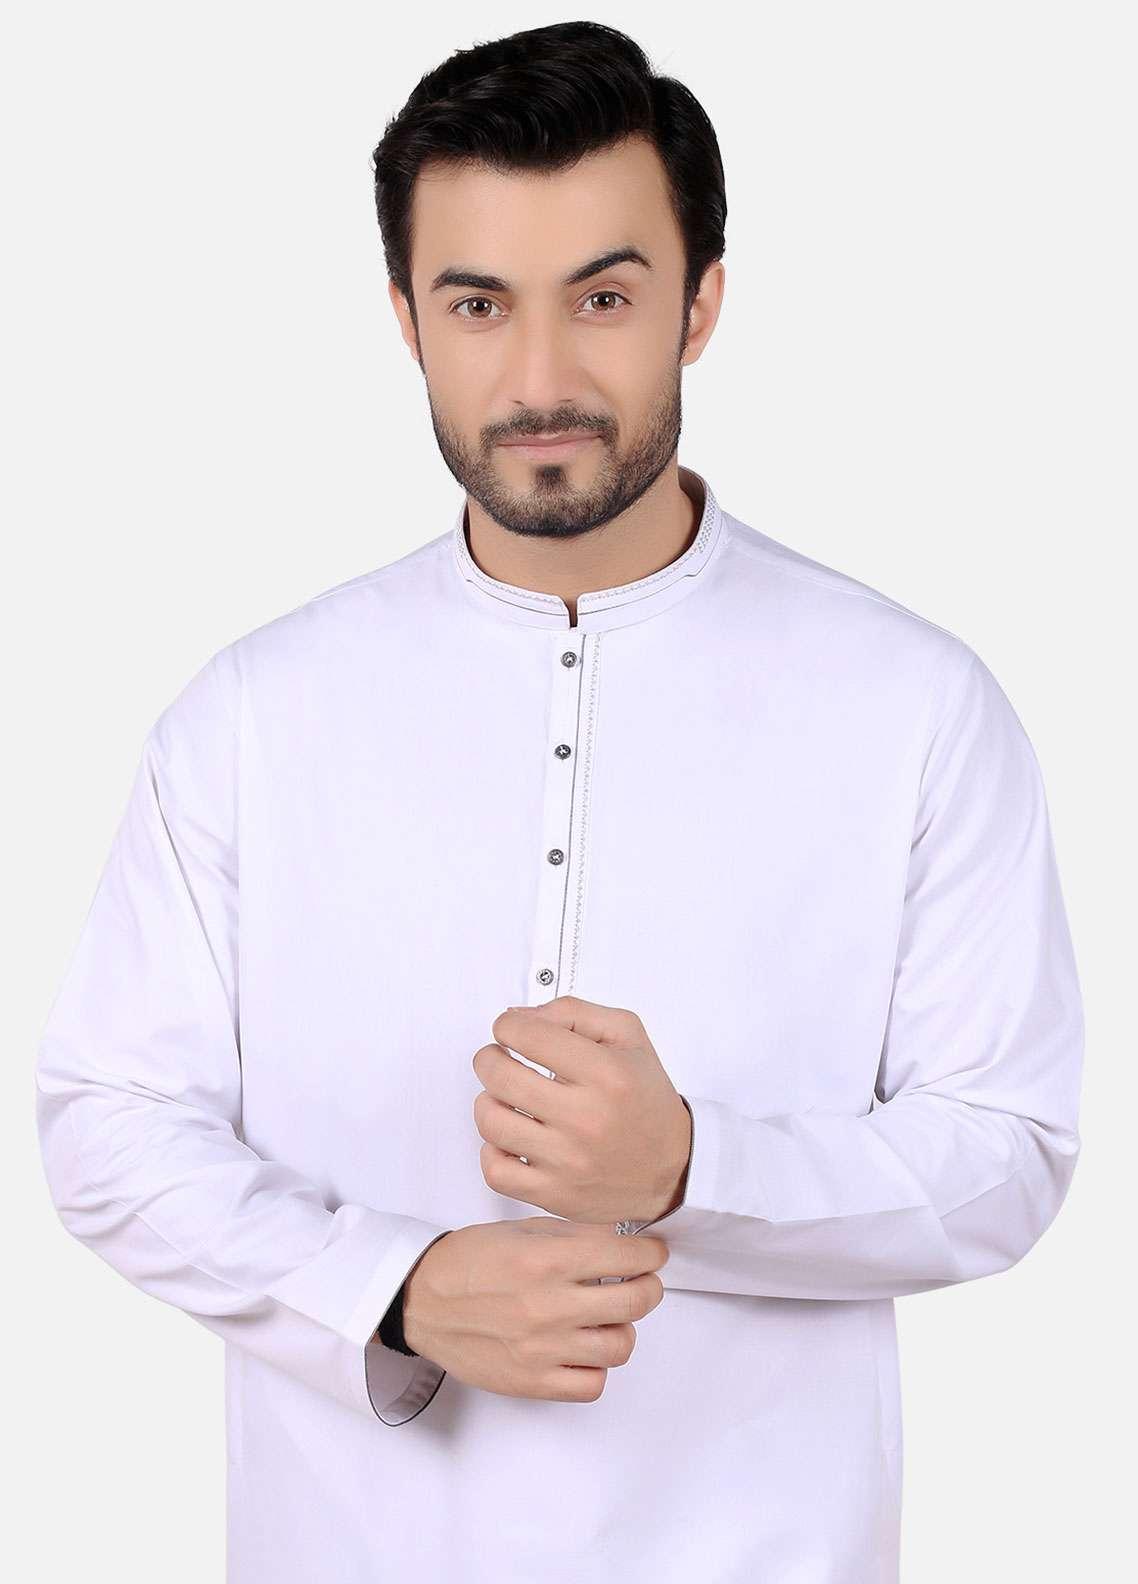 Edenrobe Cotton Formal Kameez Shalwar for Men - White EMTKS-40695